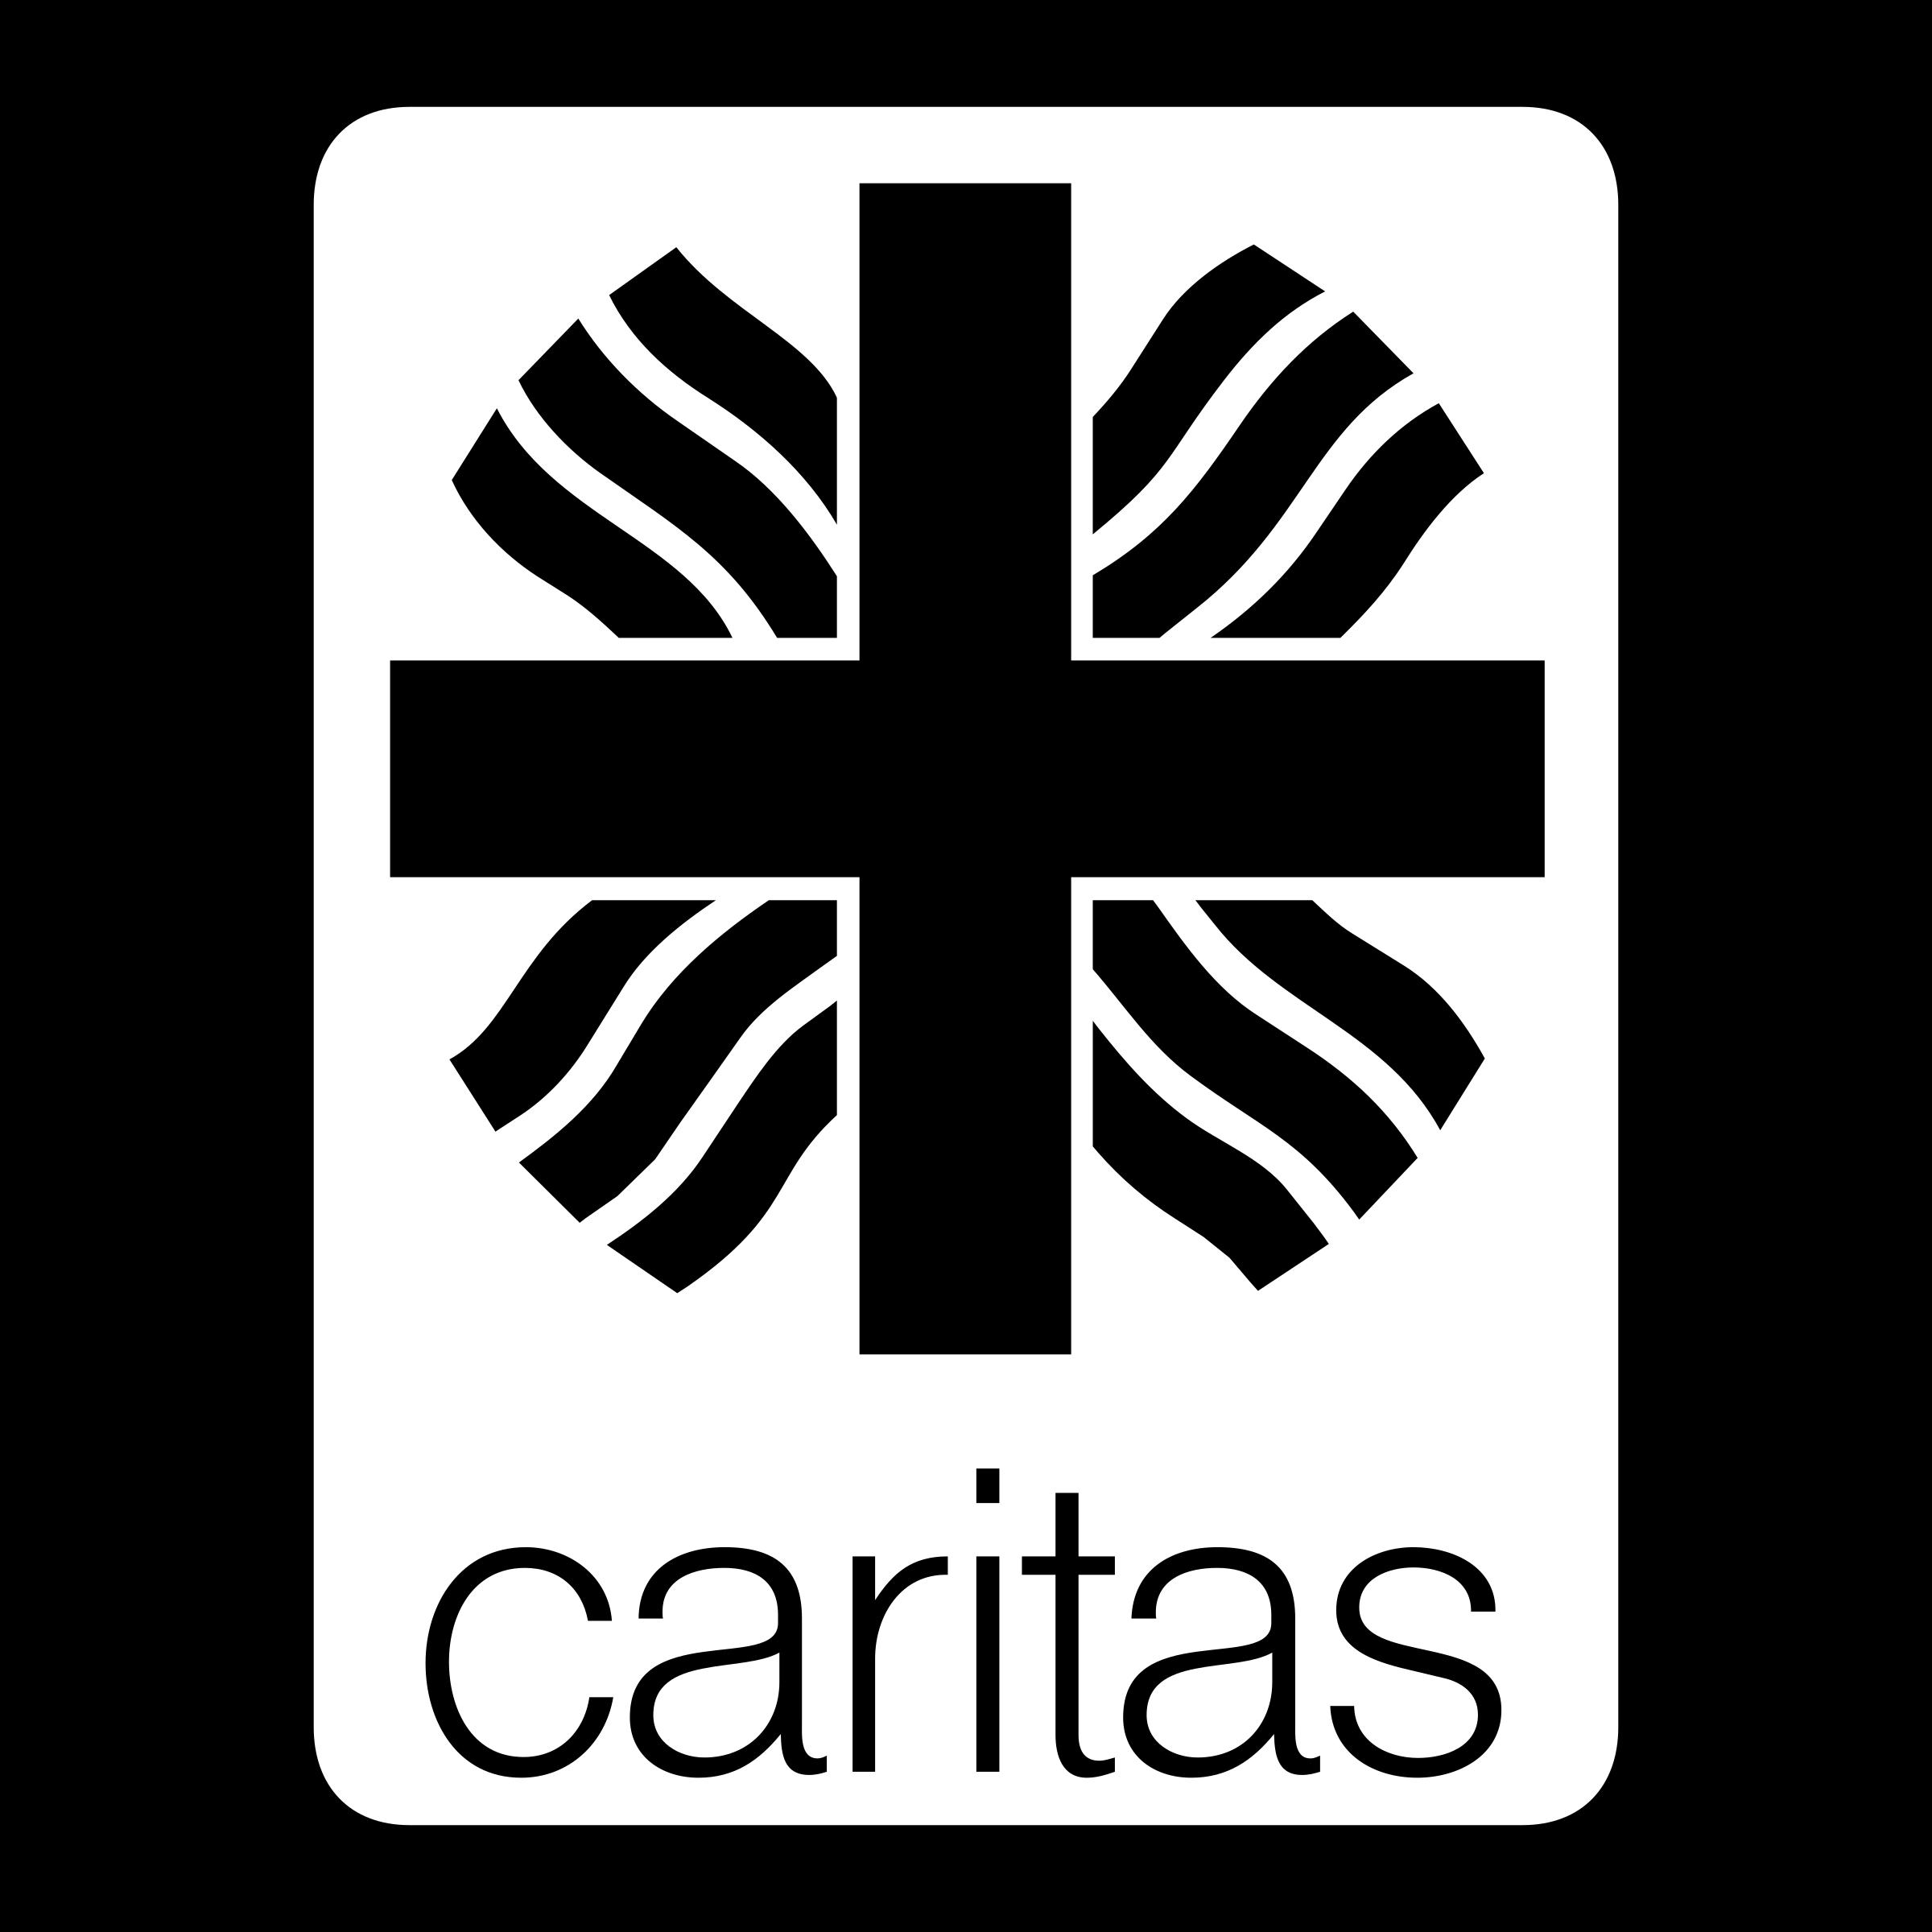 Caritas Logo PNG Transparent & SVG Vector.